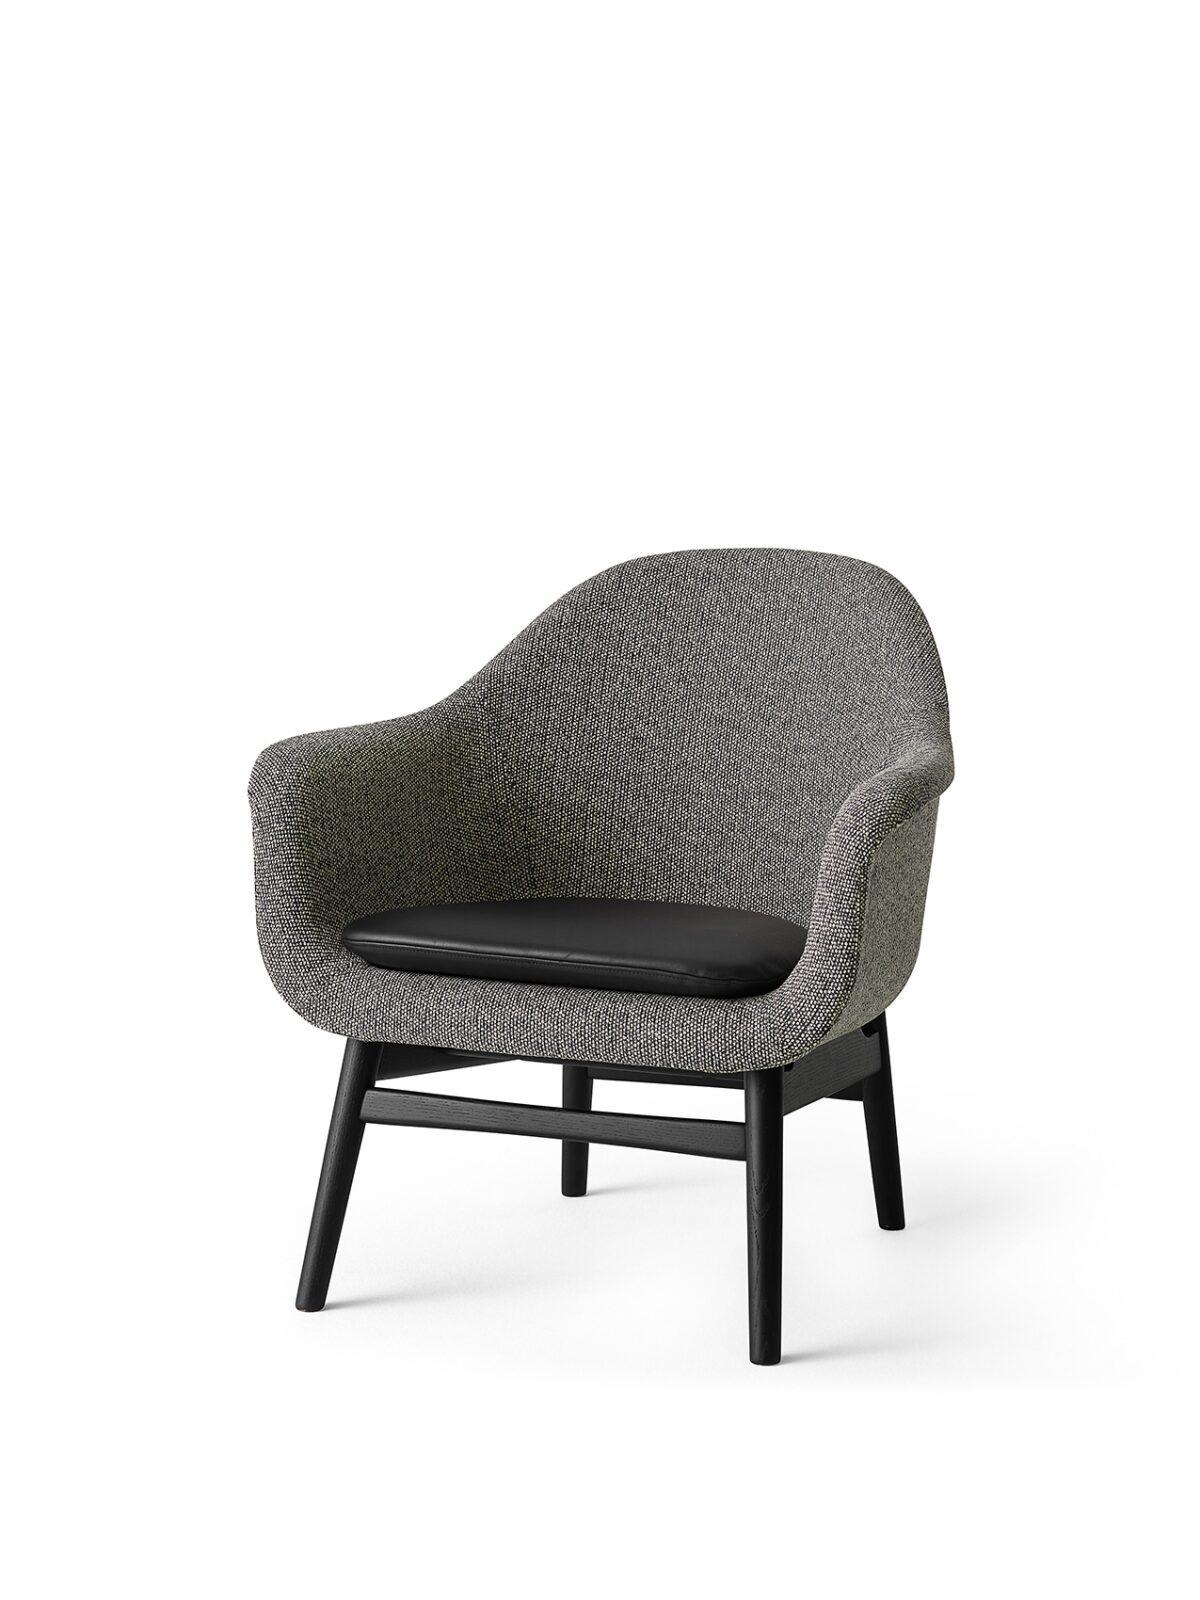 9255569 Harbour Lounge Low back Black oak Savanna 152 Shade pitch black cushion angle 1